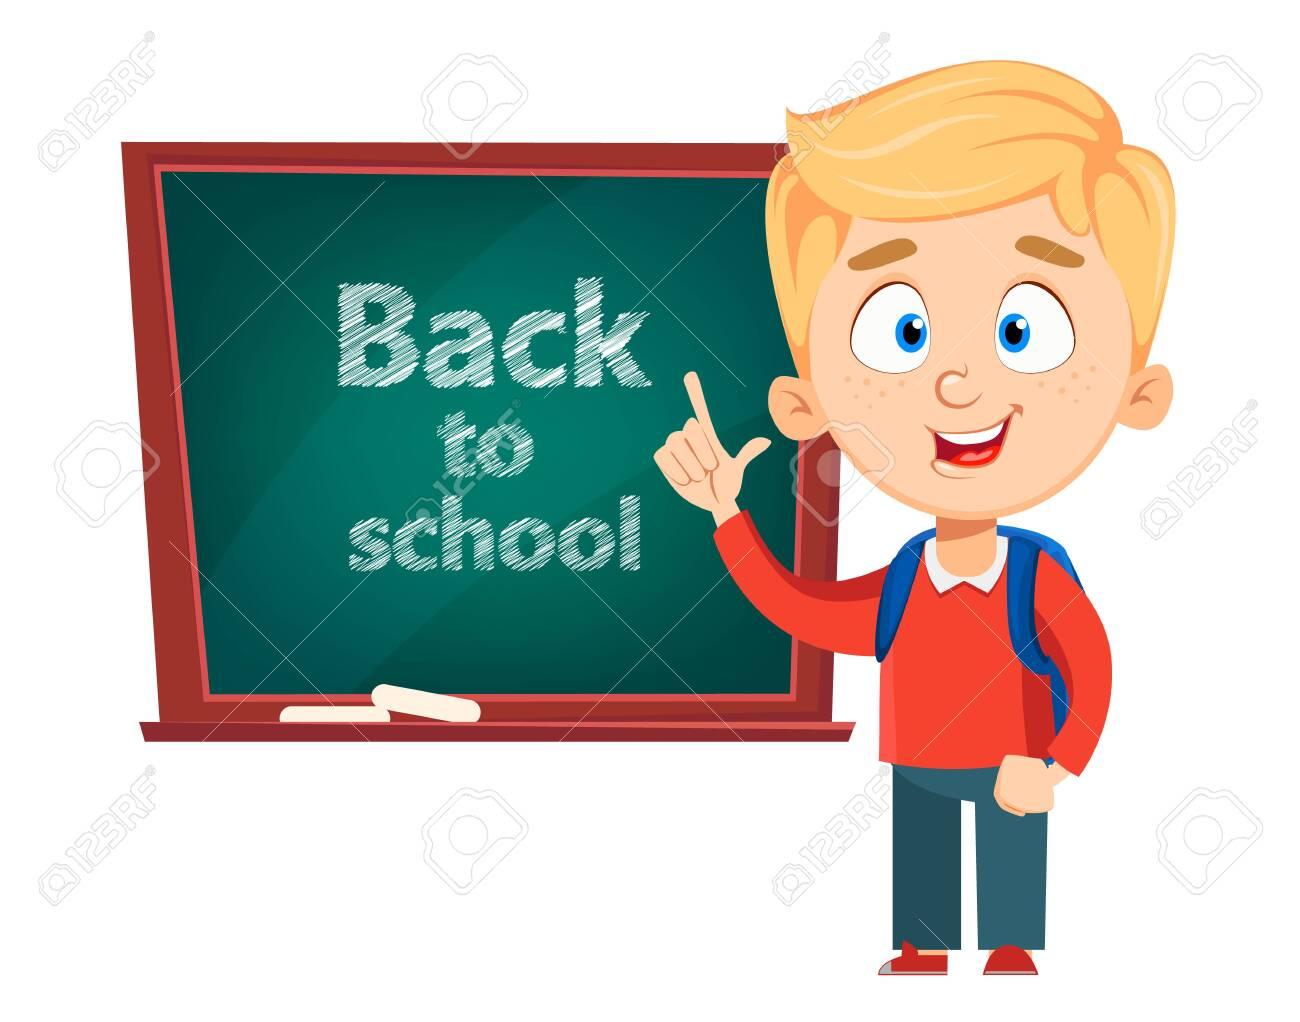 Back to school. Cute schoolboy standing near blackboard. Funny kid cartoon character. Vector illustration. - 128232091